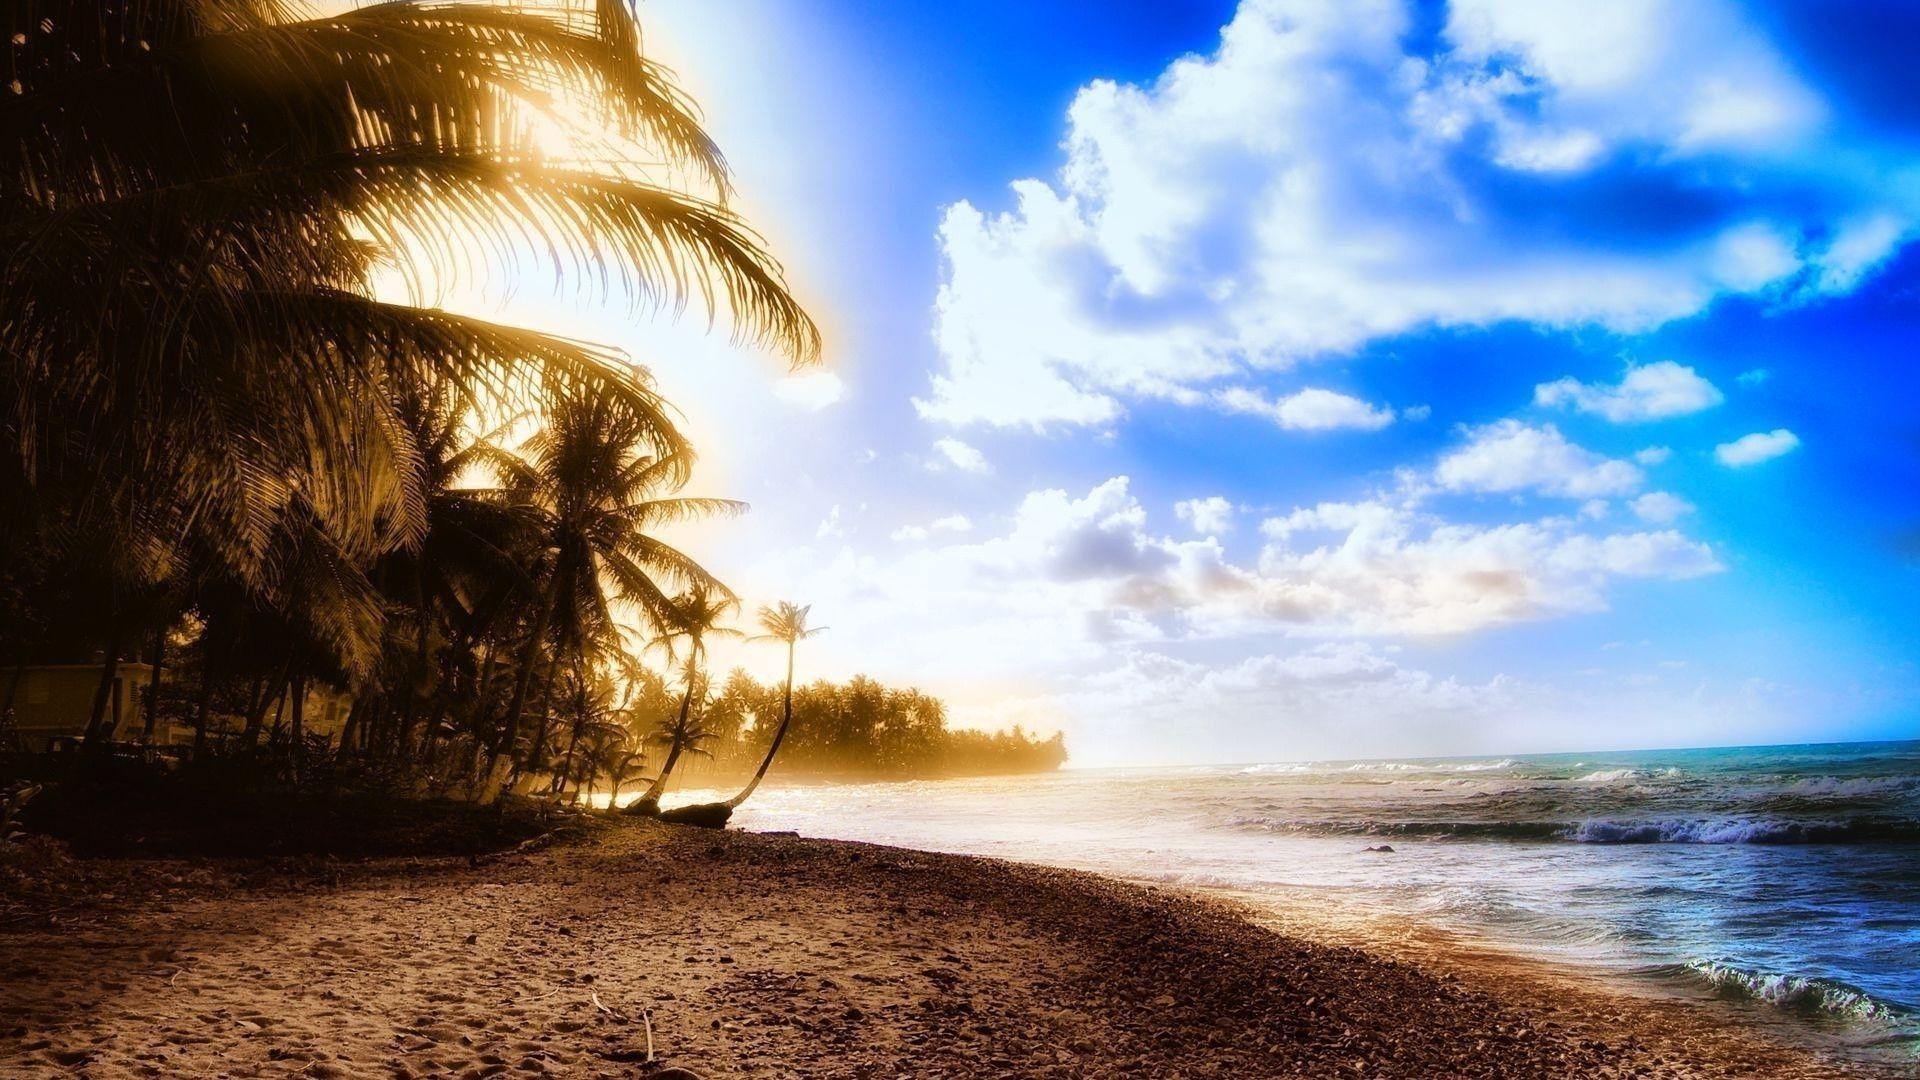 Palm trees on the beach HD wallpaper